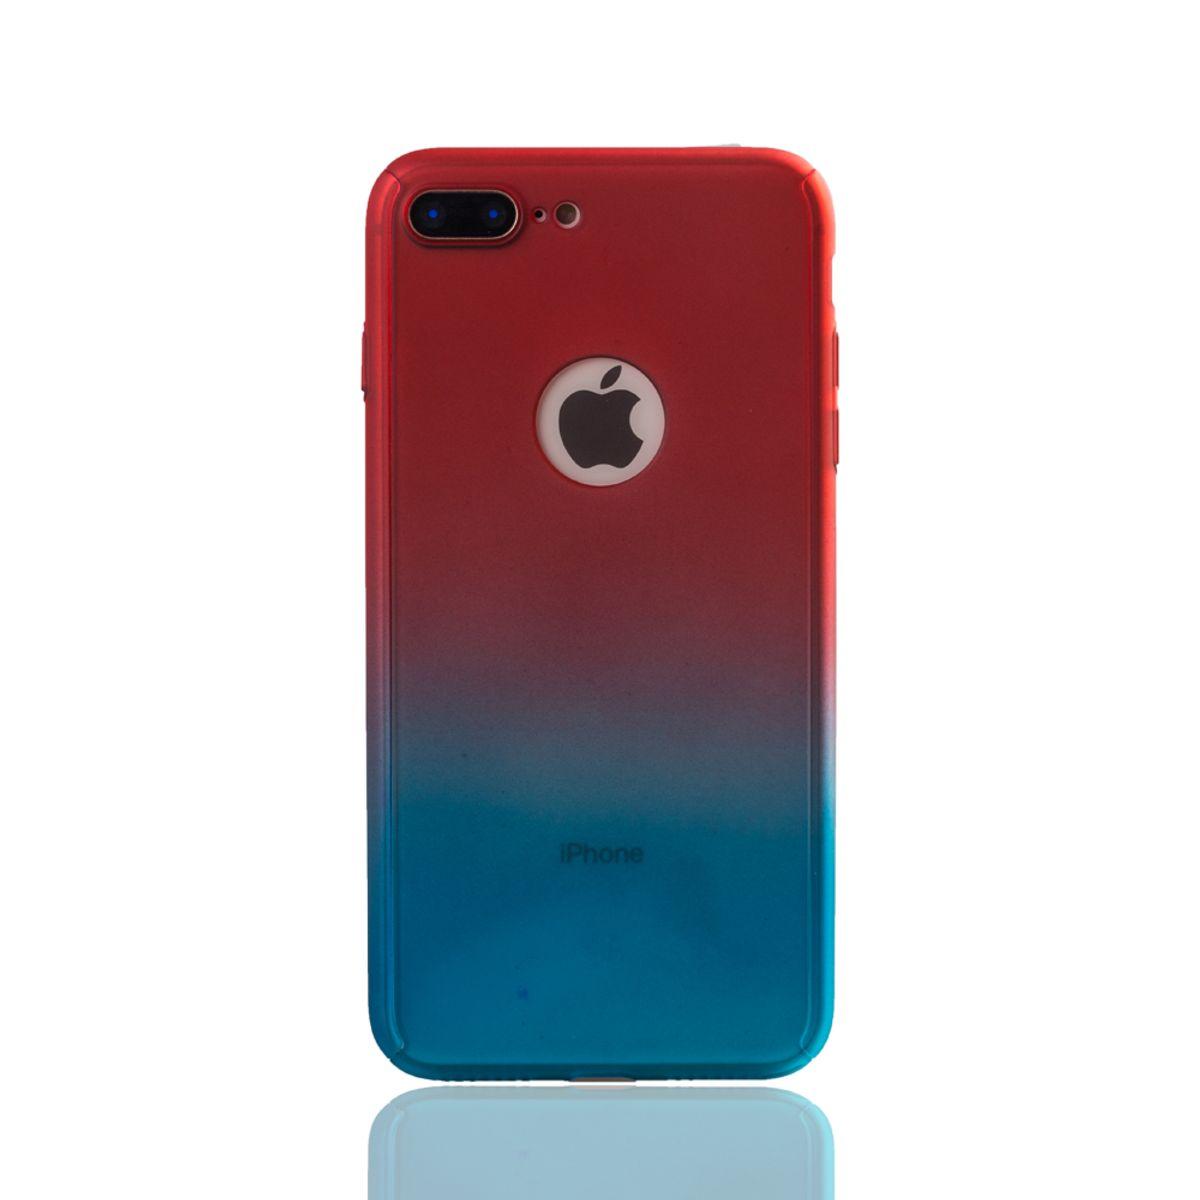 apple iphone 7 plus handy h lle schutz case cover panzer schutz glas rot blau. Black Bedroom Furniture Sets. Home Design Ideas